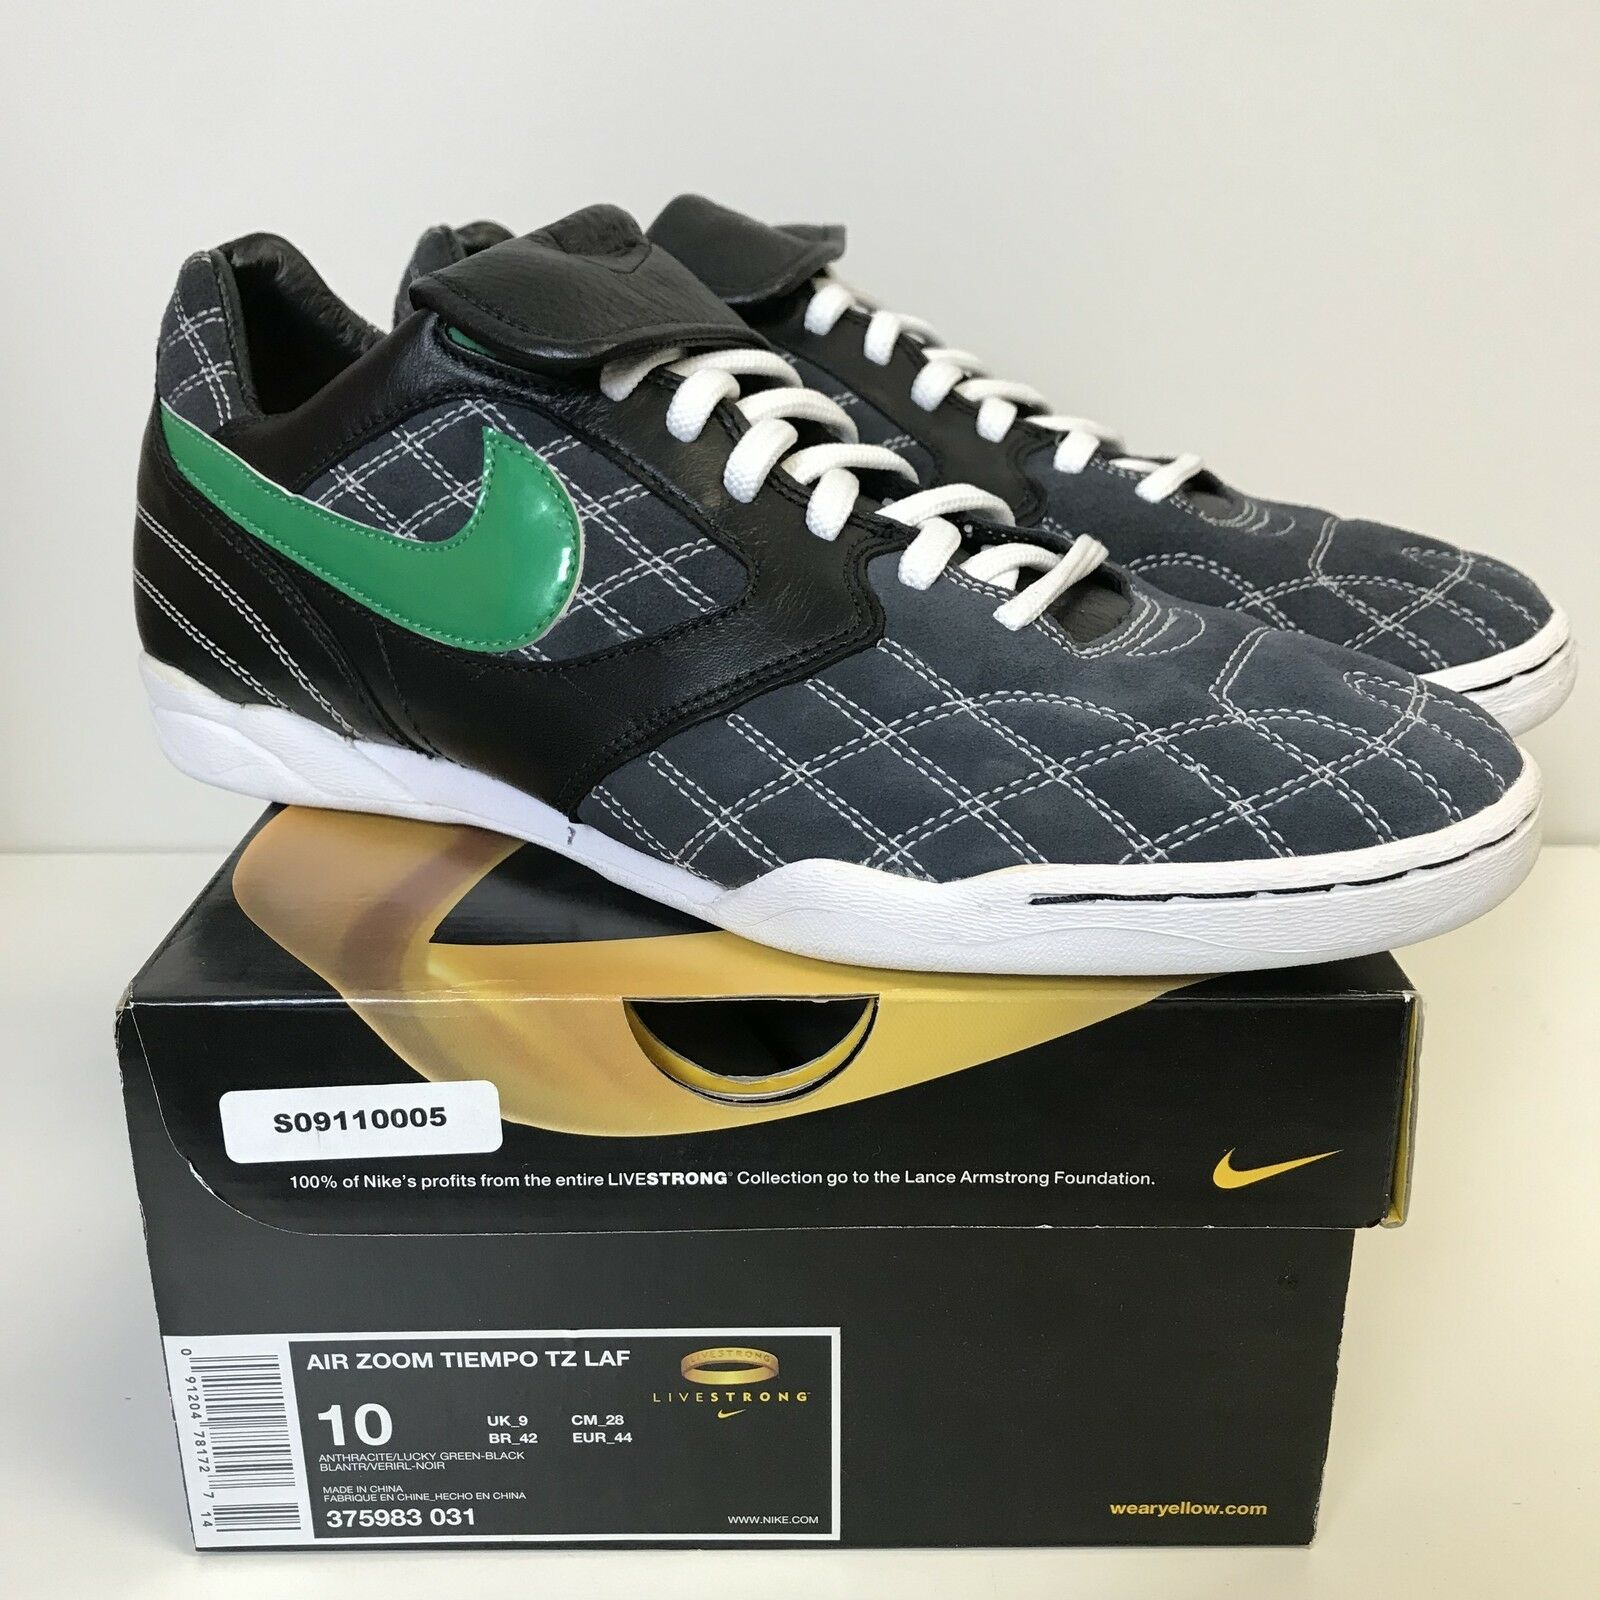 Nike air zoom tiempo tz cappa a flusso flusso flusso laminare lance armstrong limited livestrong 375983-031 10 | Aspetto piacevole  459701